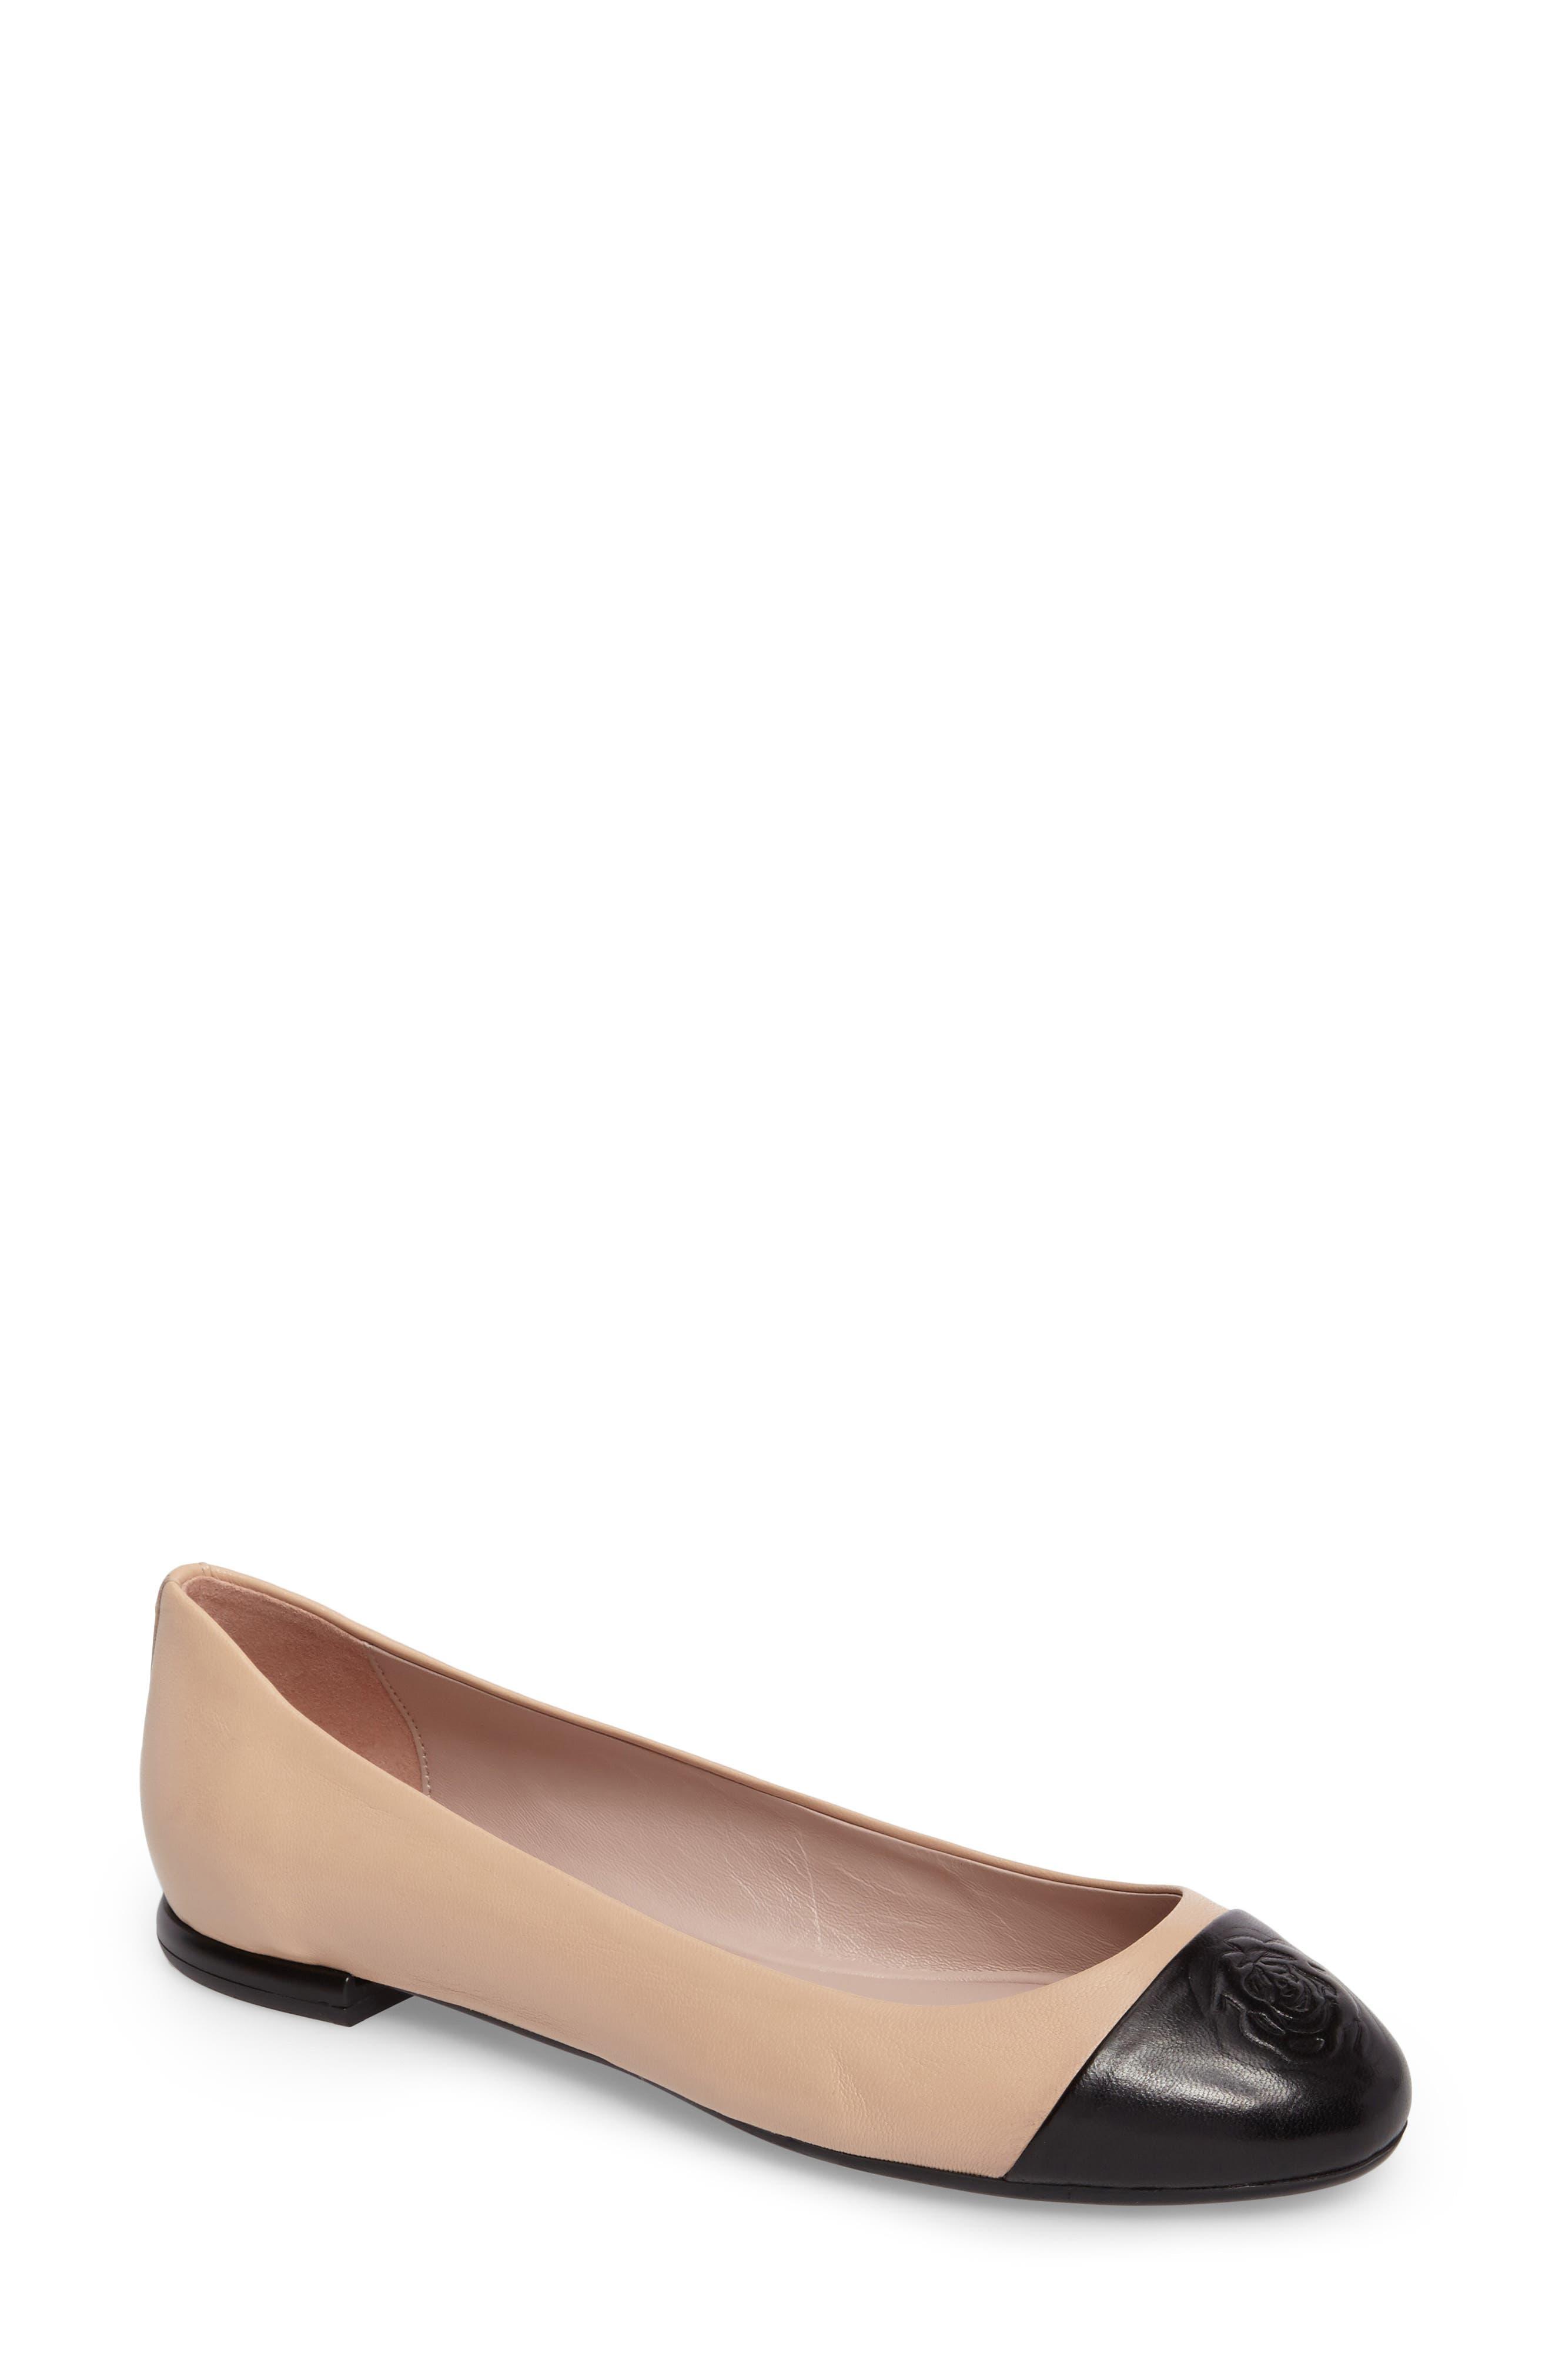 Rosa Ballet Flat,                         Main,                         color, Beige/ Black Leather